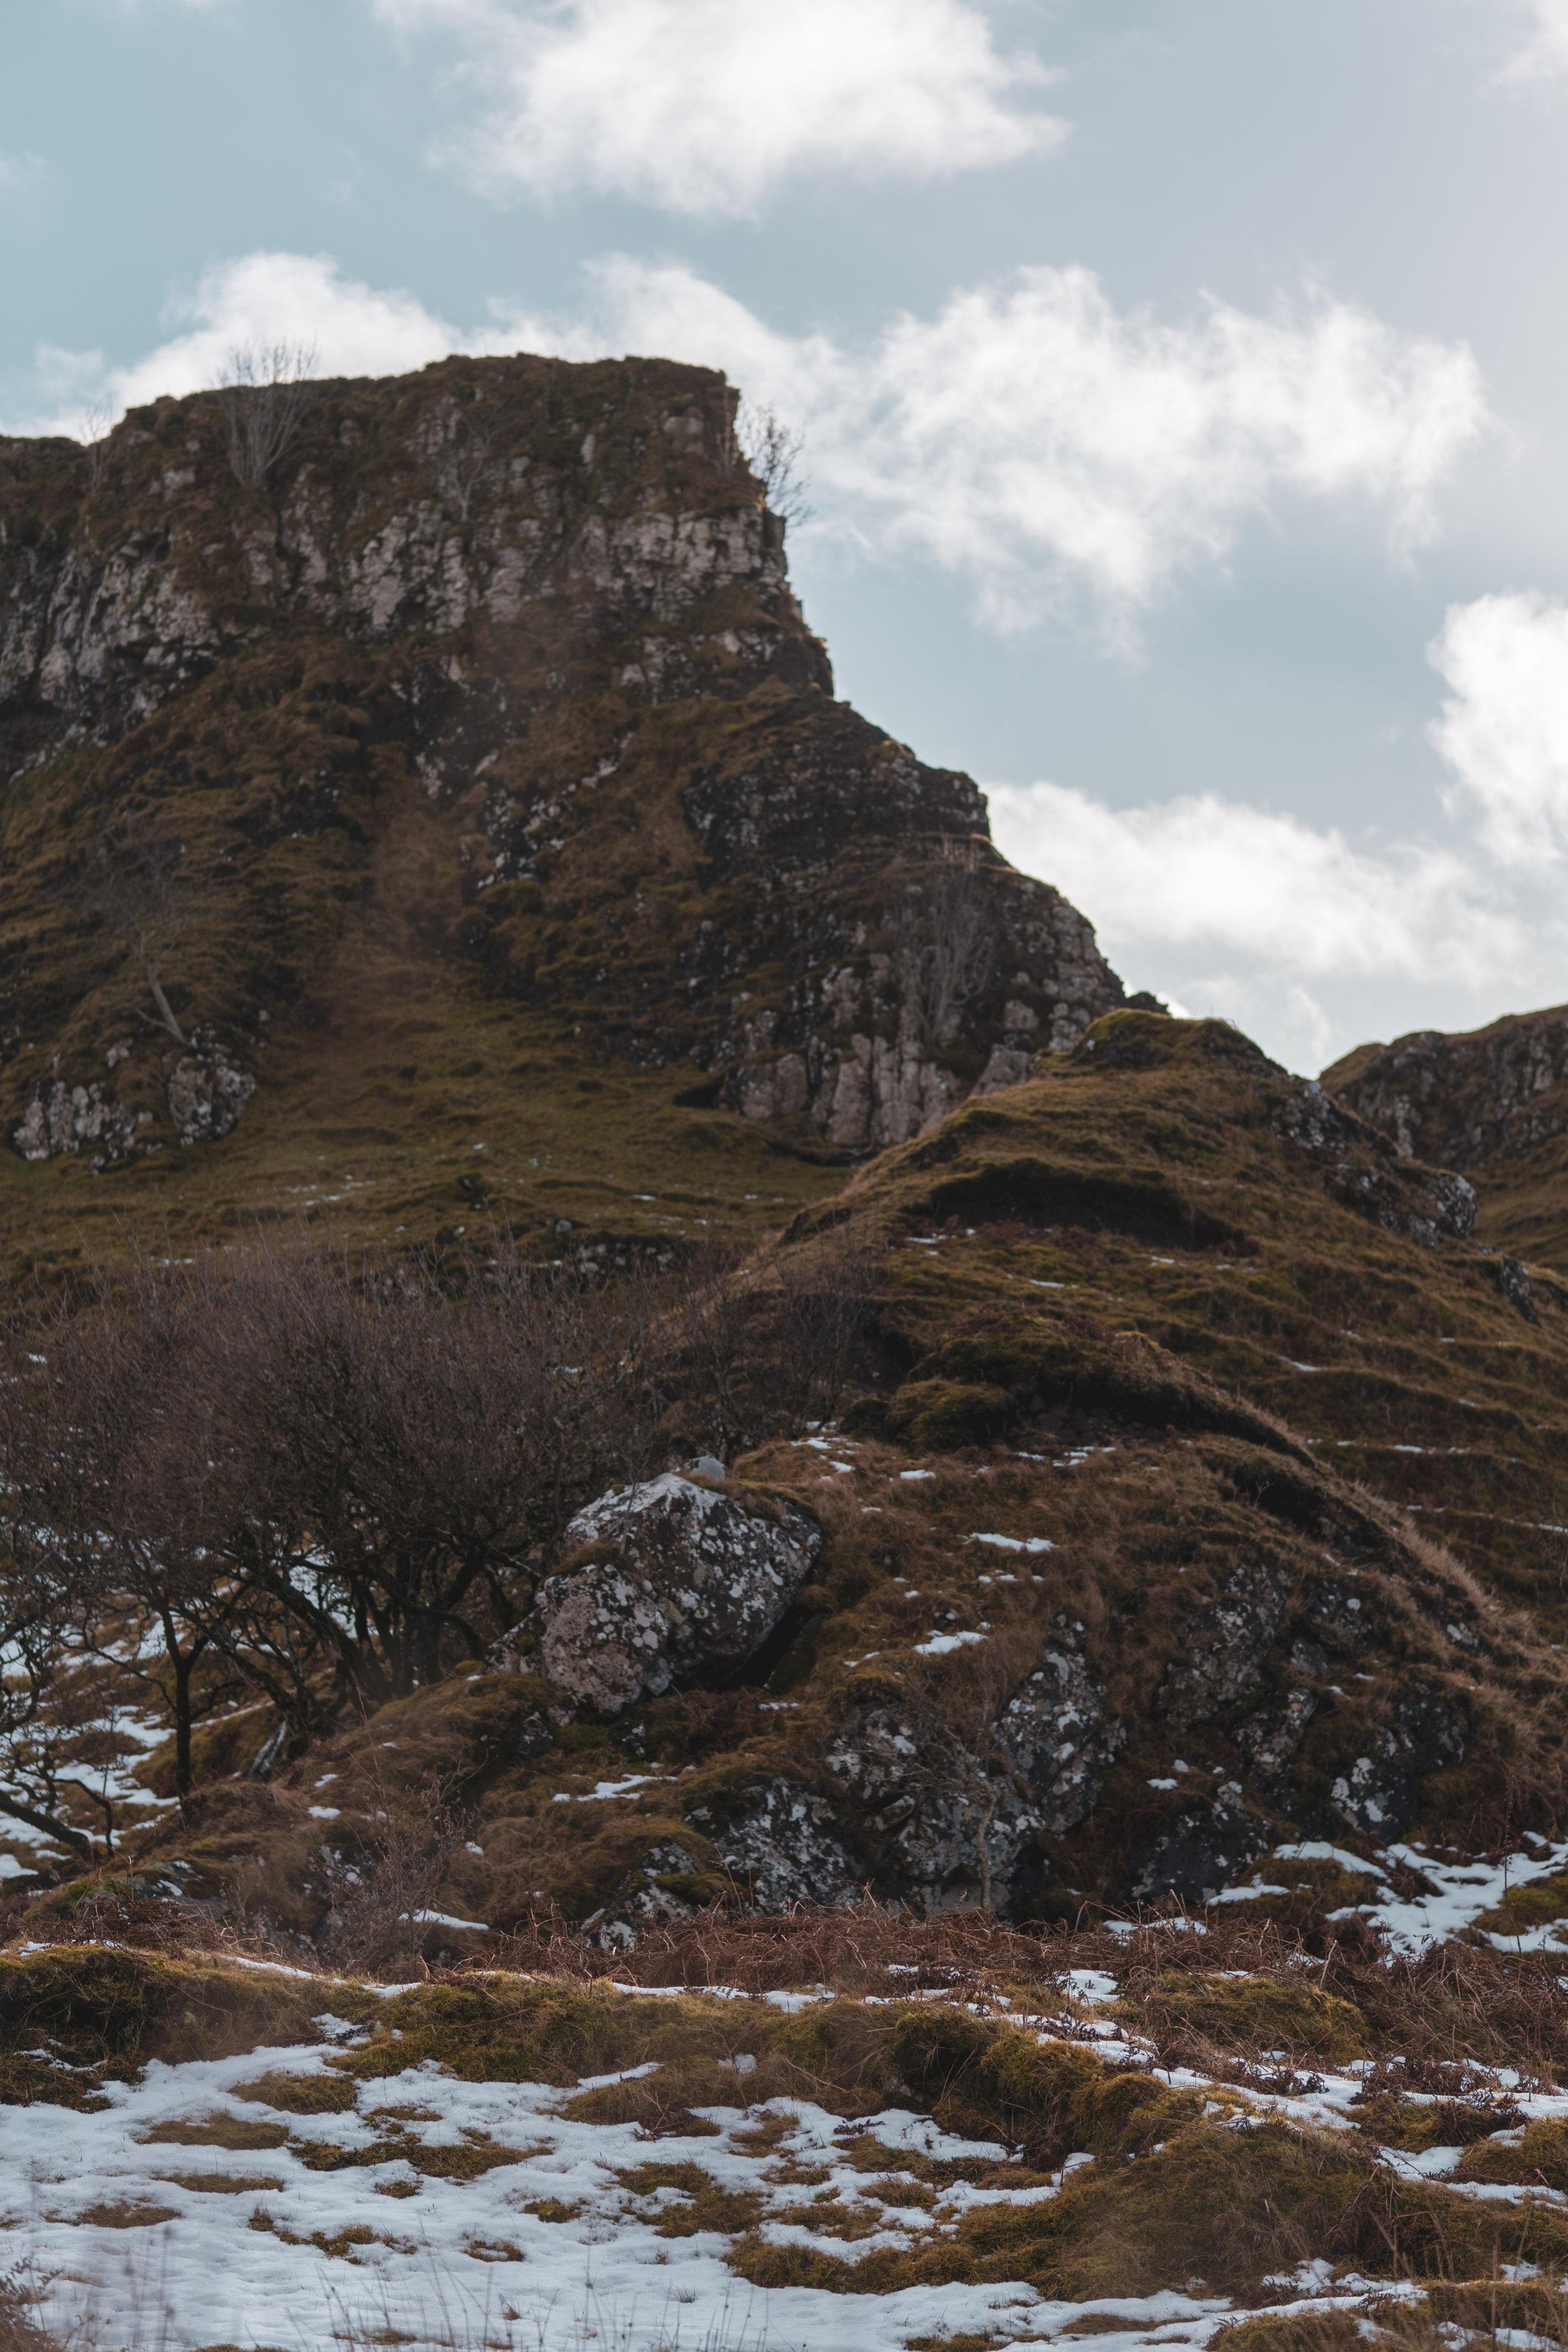 Isle-of-Skye-Fairy-Glen-und-Braes (19).jpg